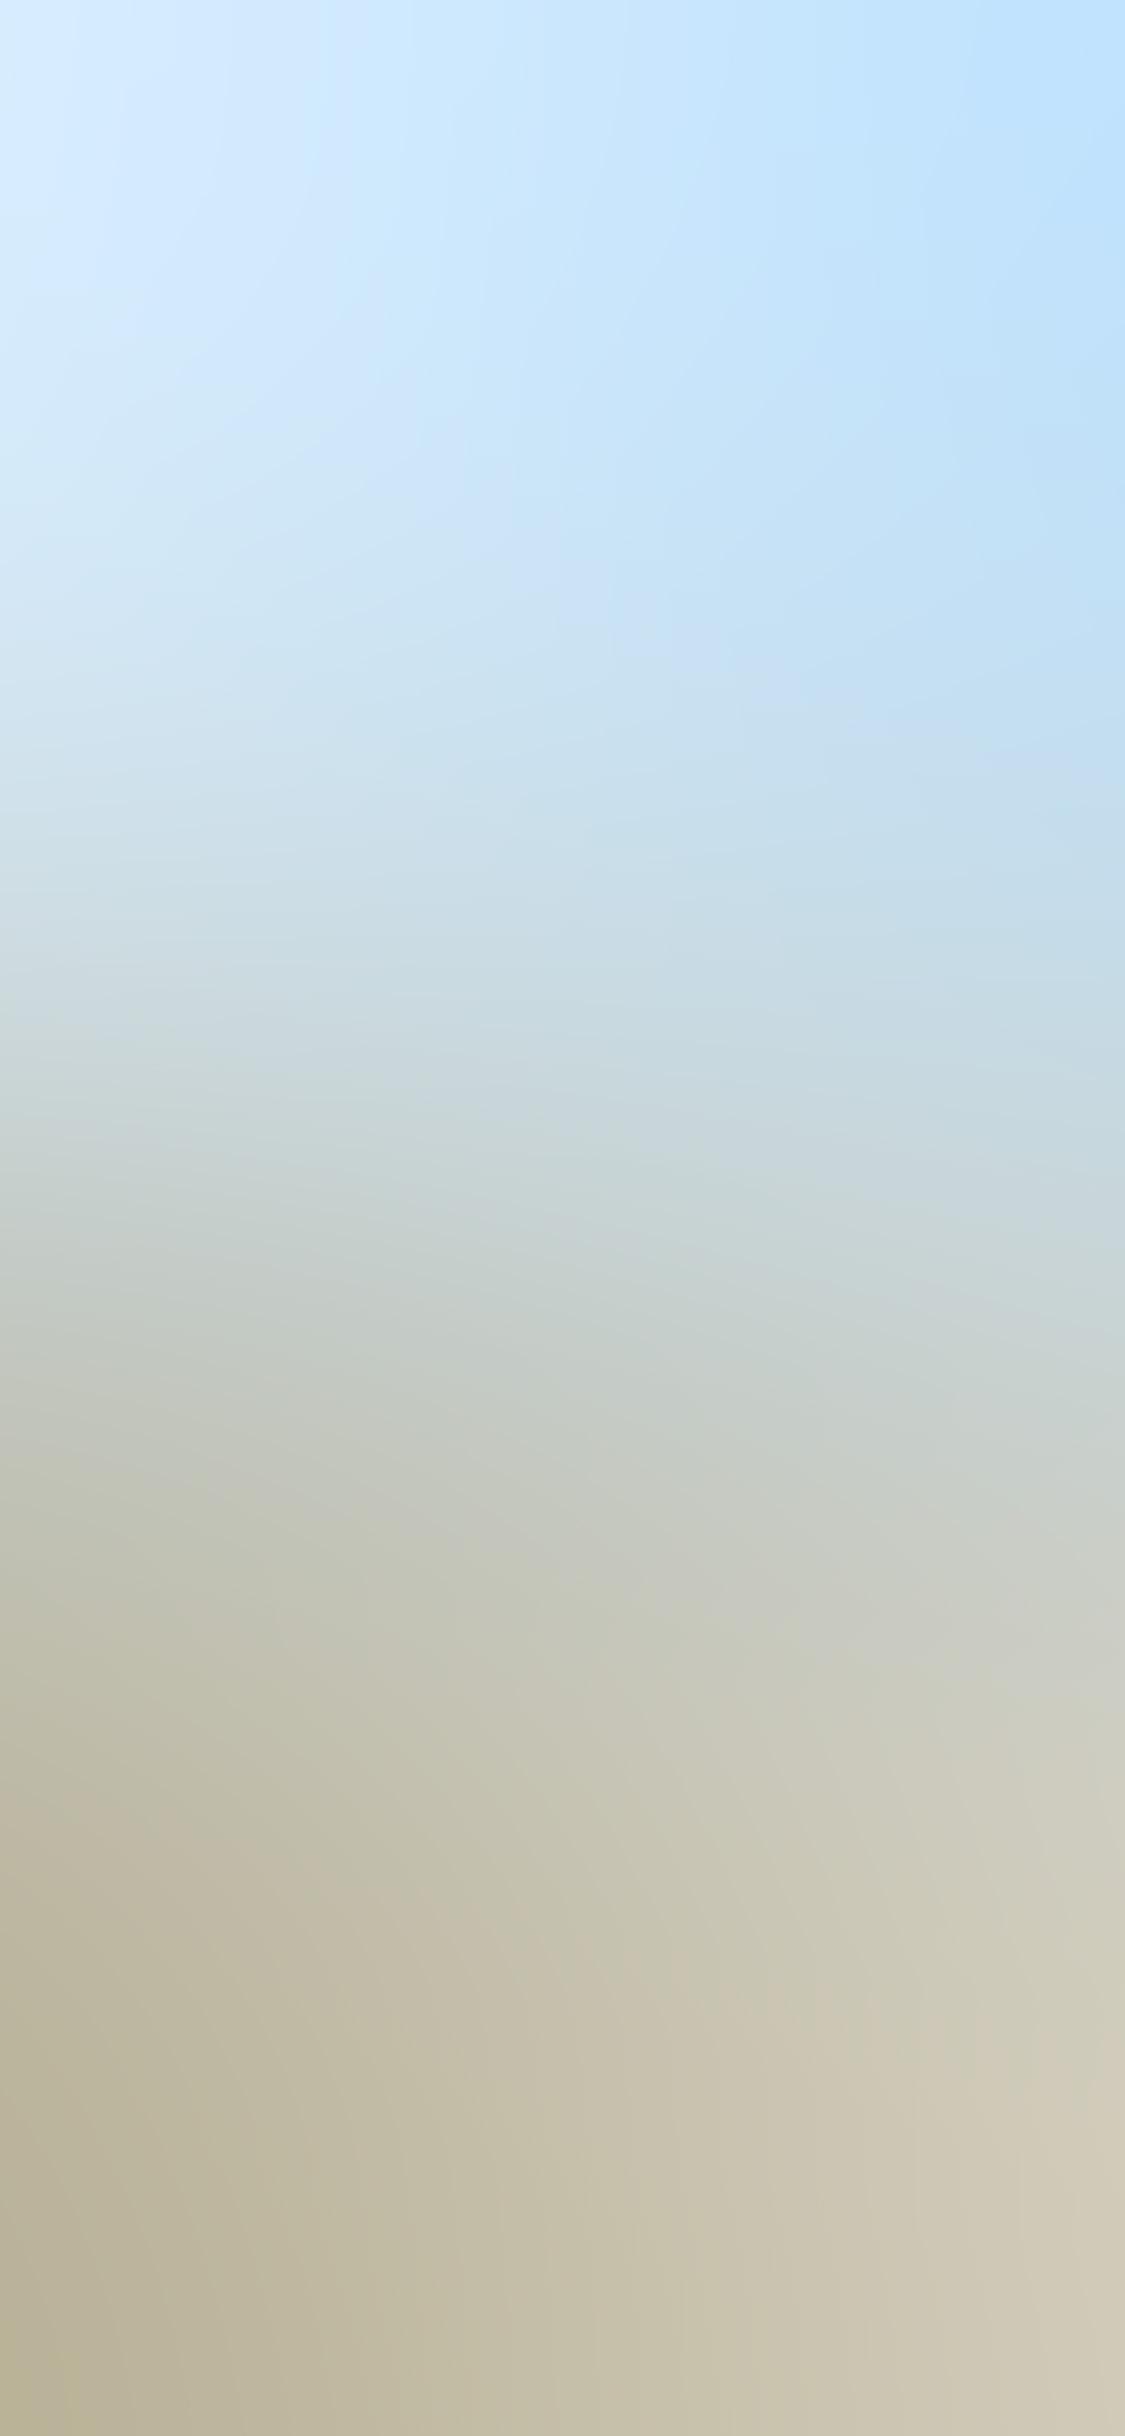 iPhonexpapers.com-Apple-iPhone-wallpaper-sn82-blue-pastel-soft-blur-gradation